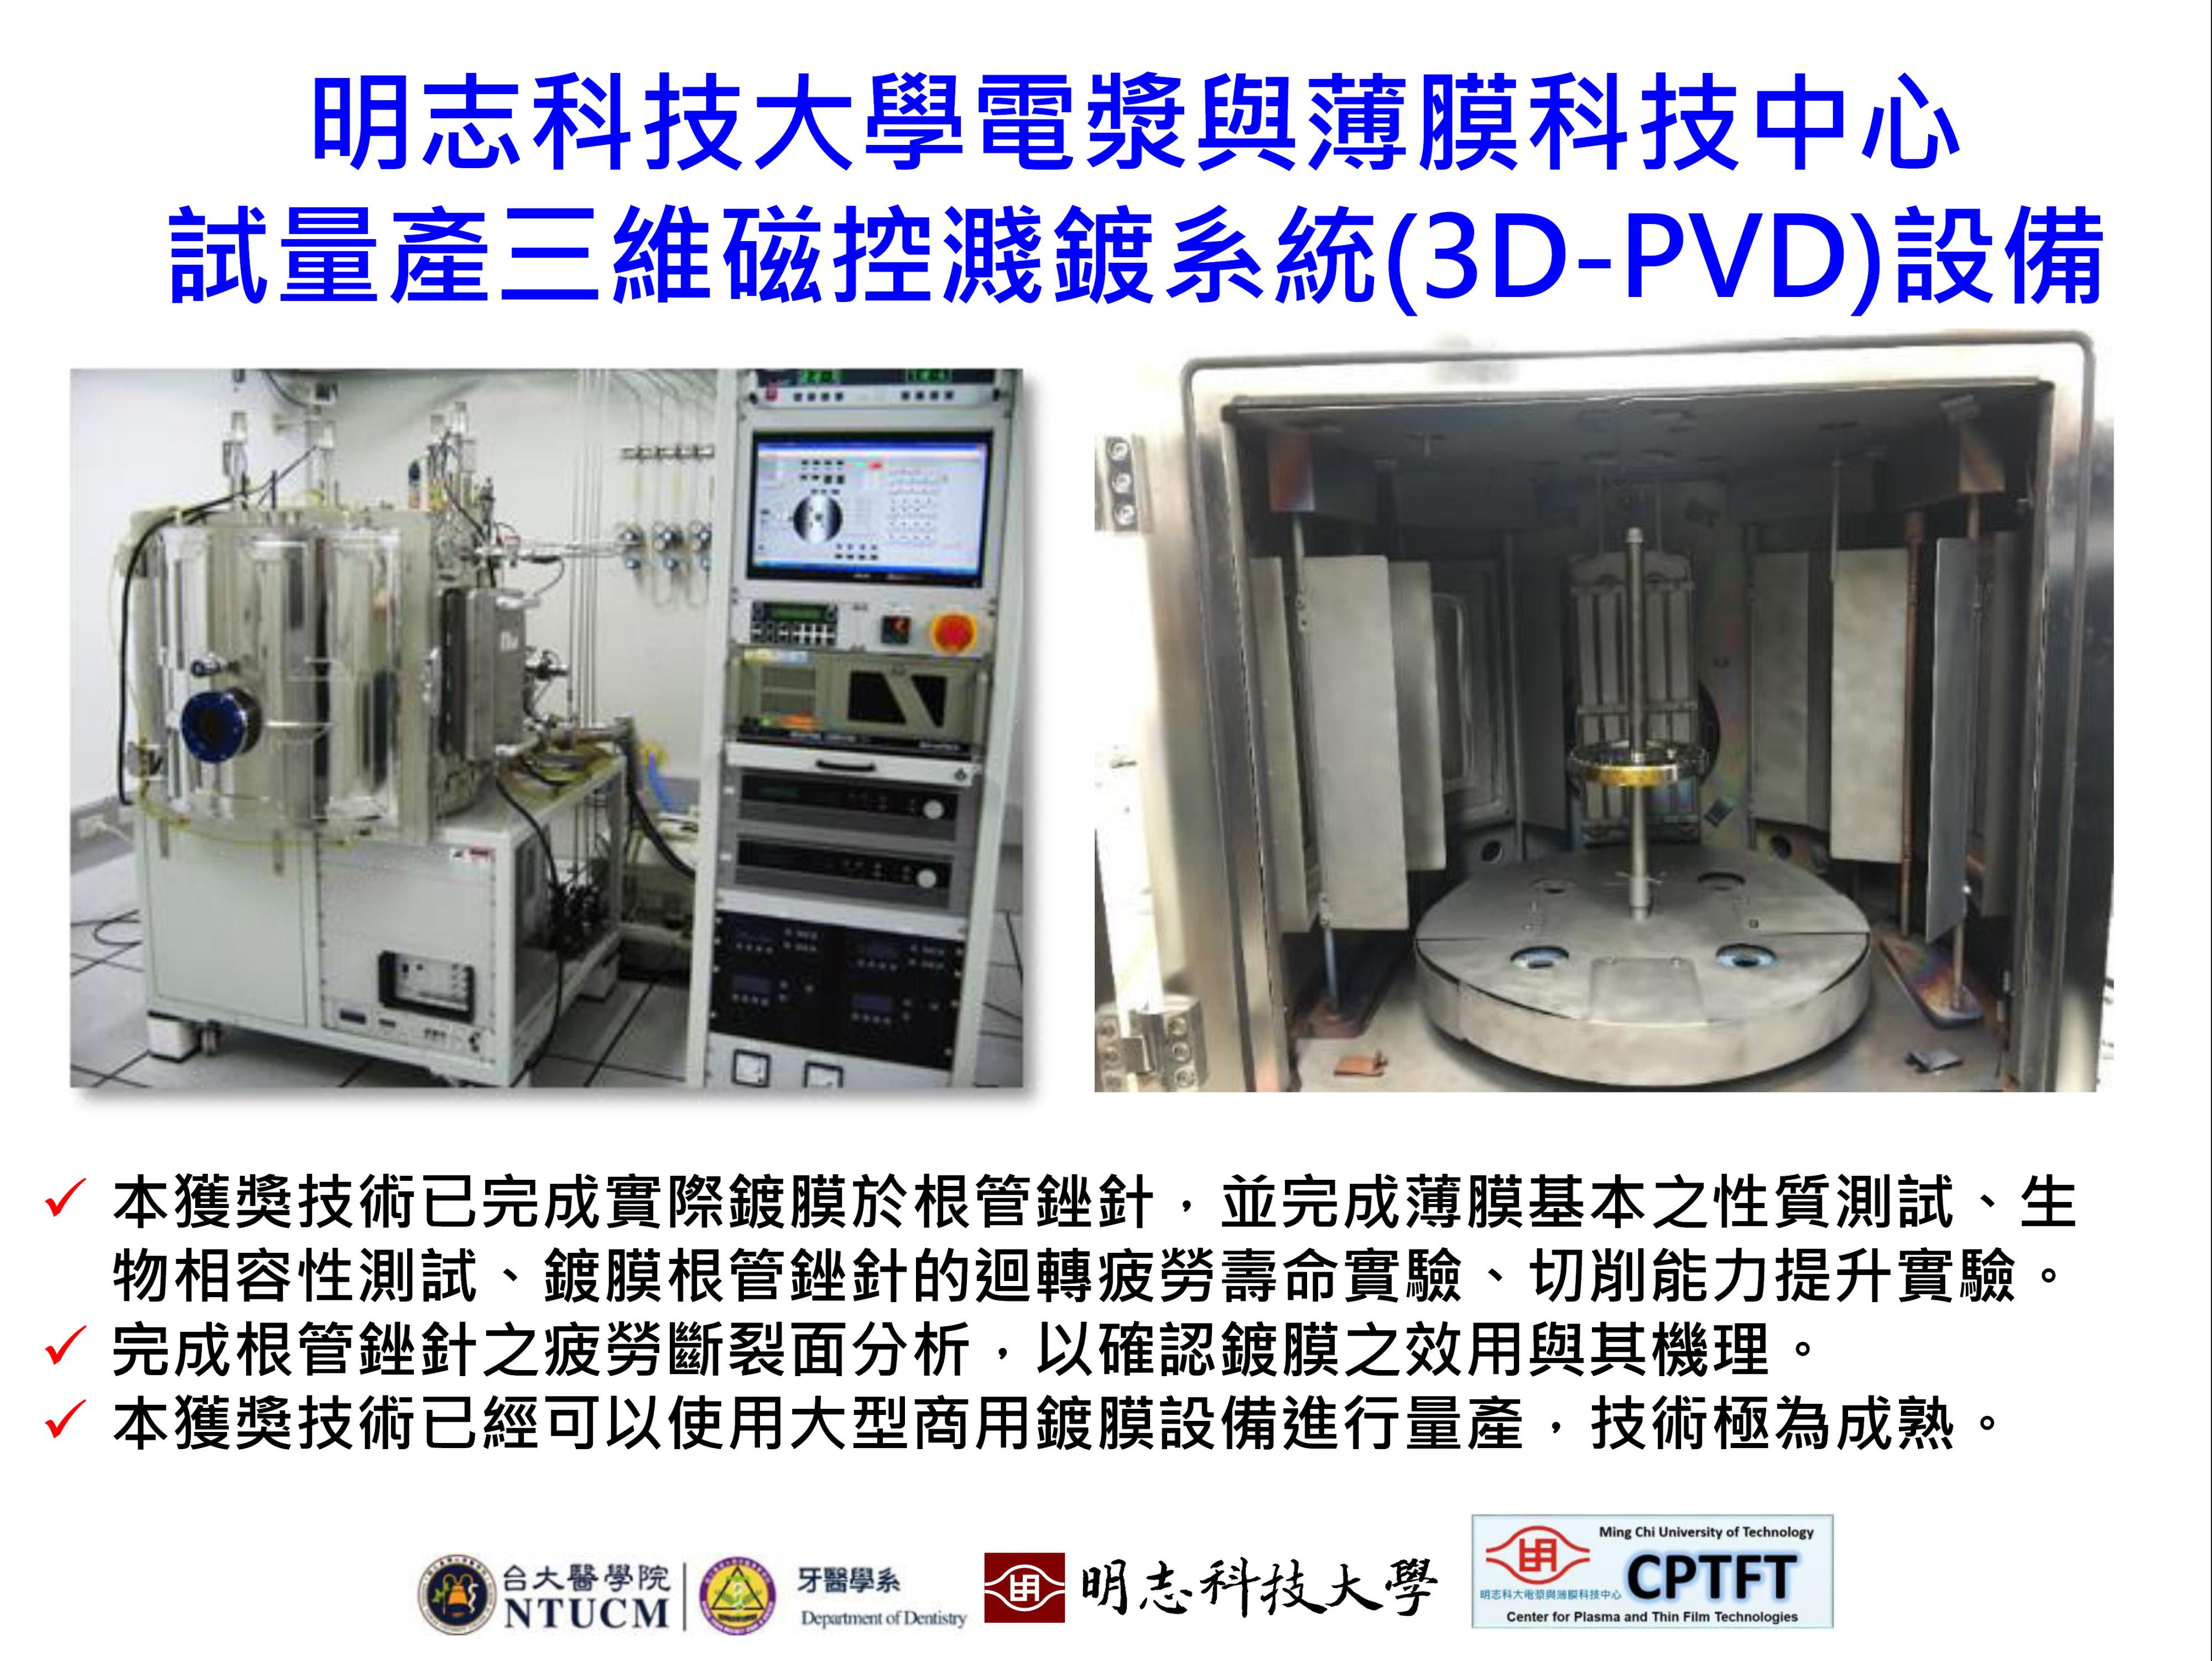 3D-PVD設備